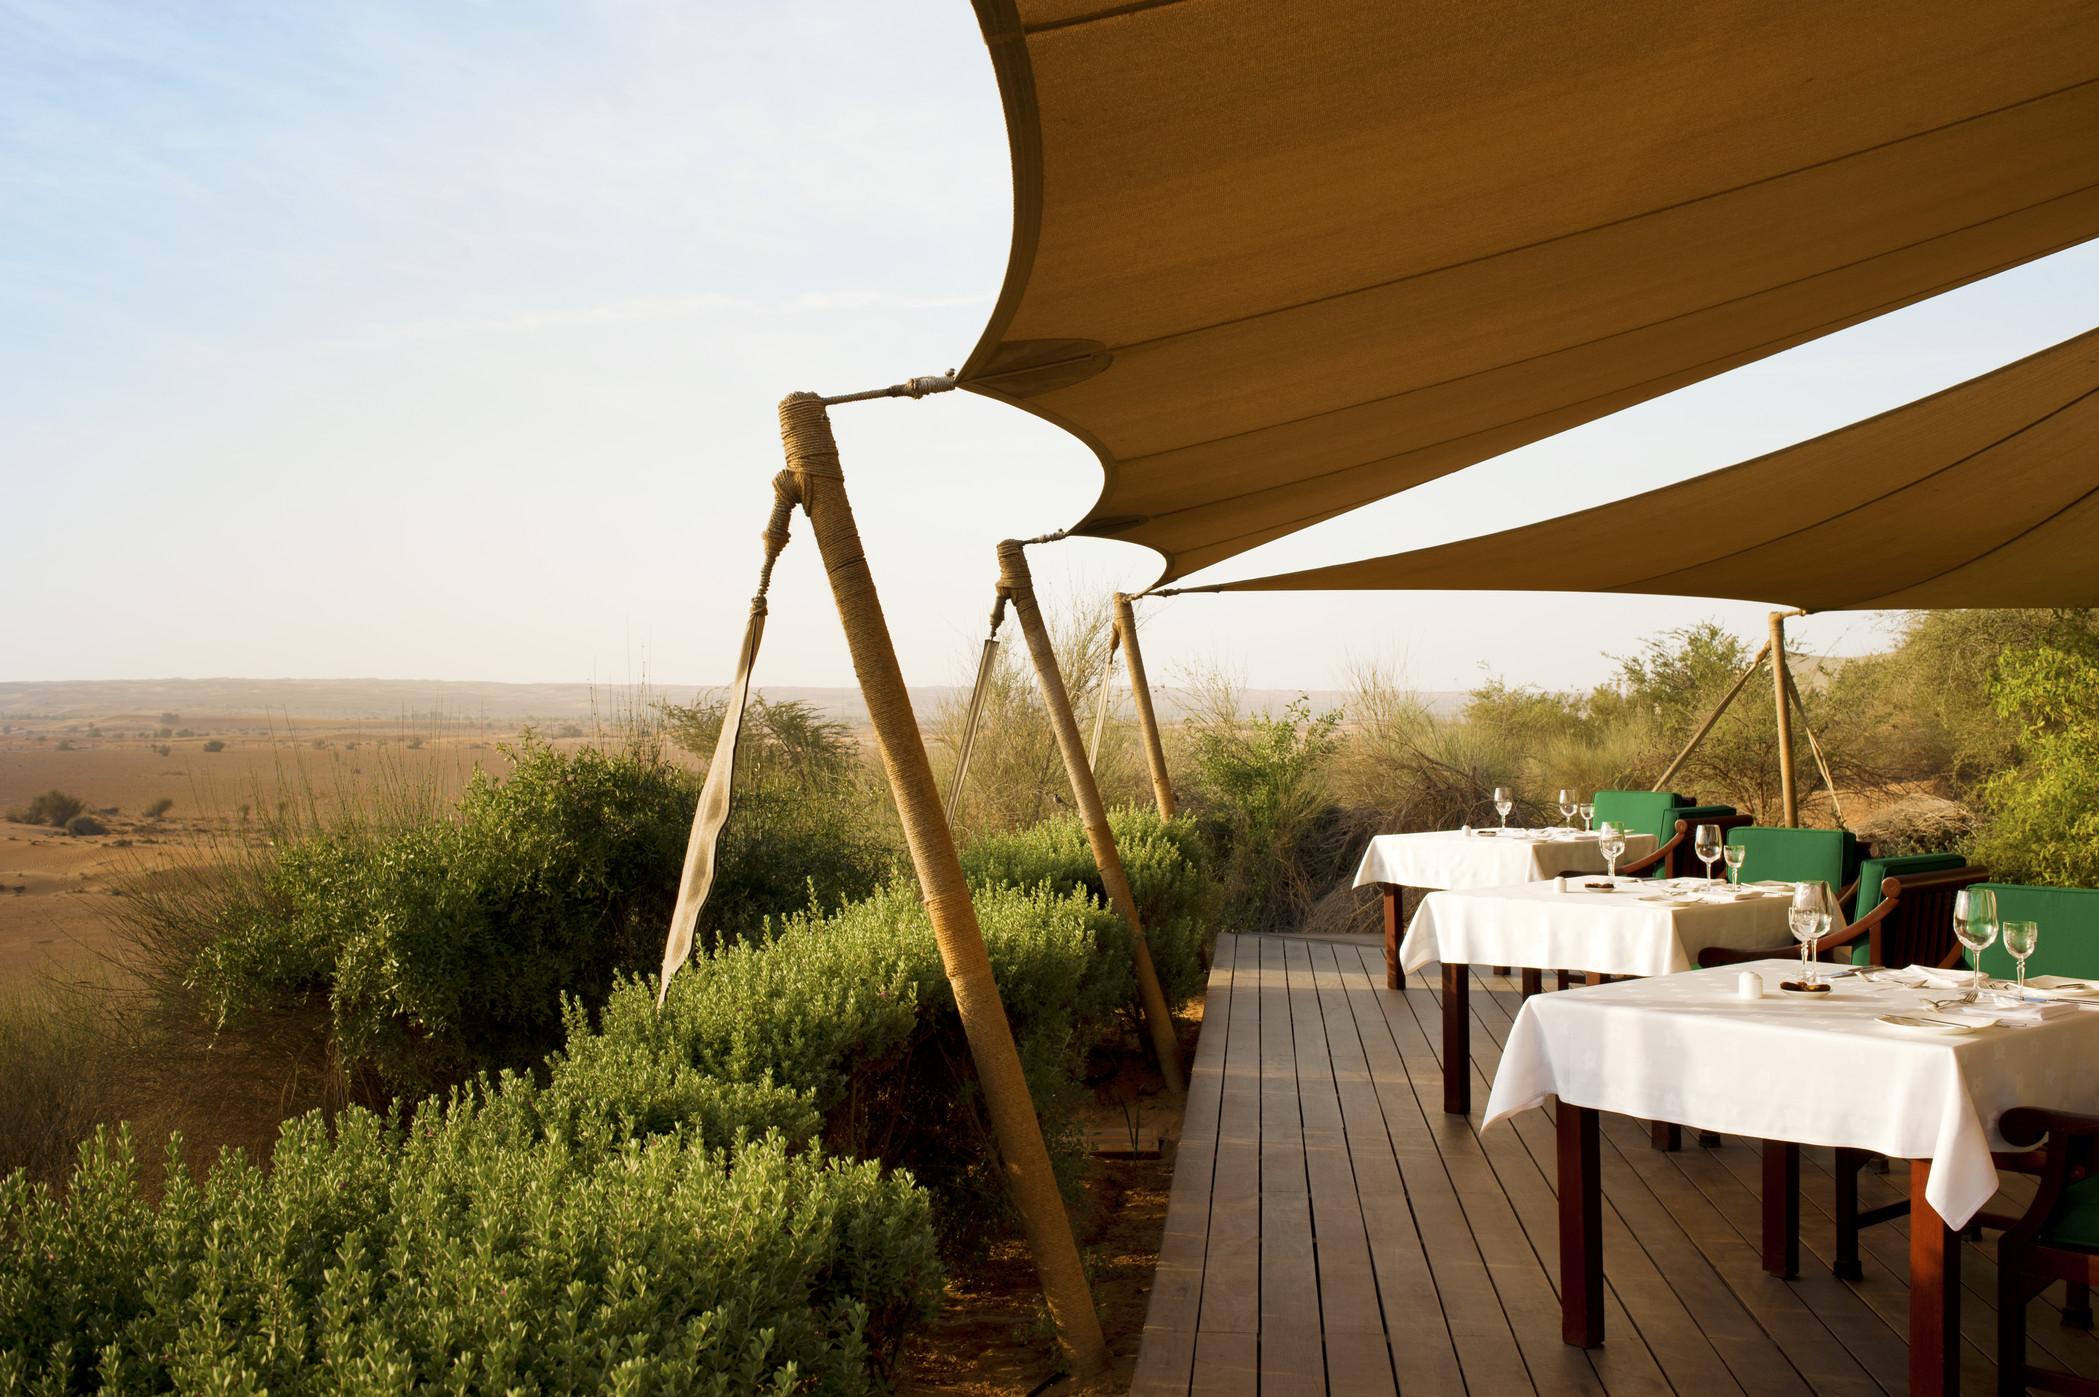 Al Maha Luxury Desert Resort and Spa in Dubai